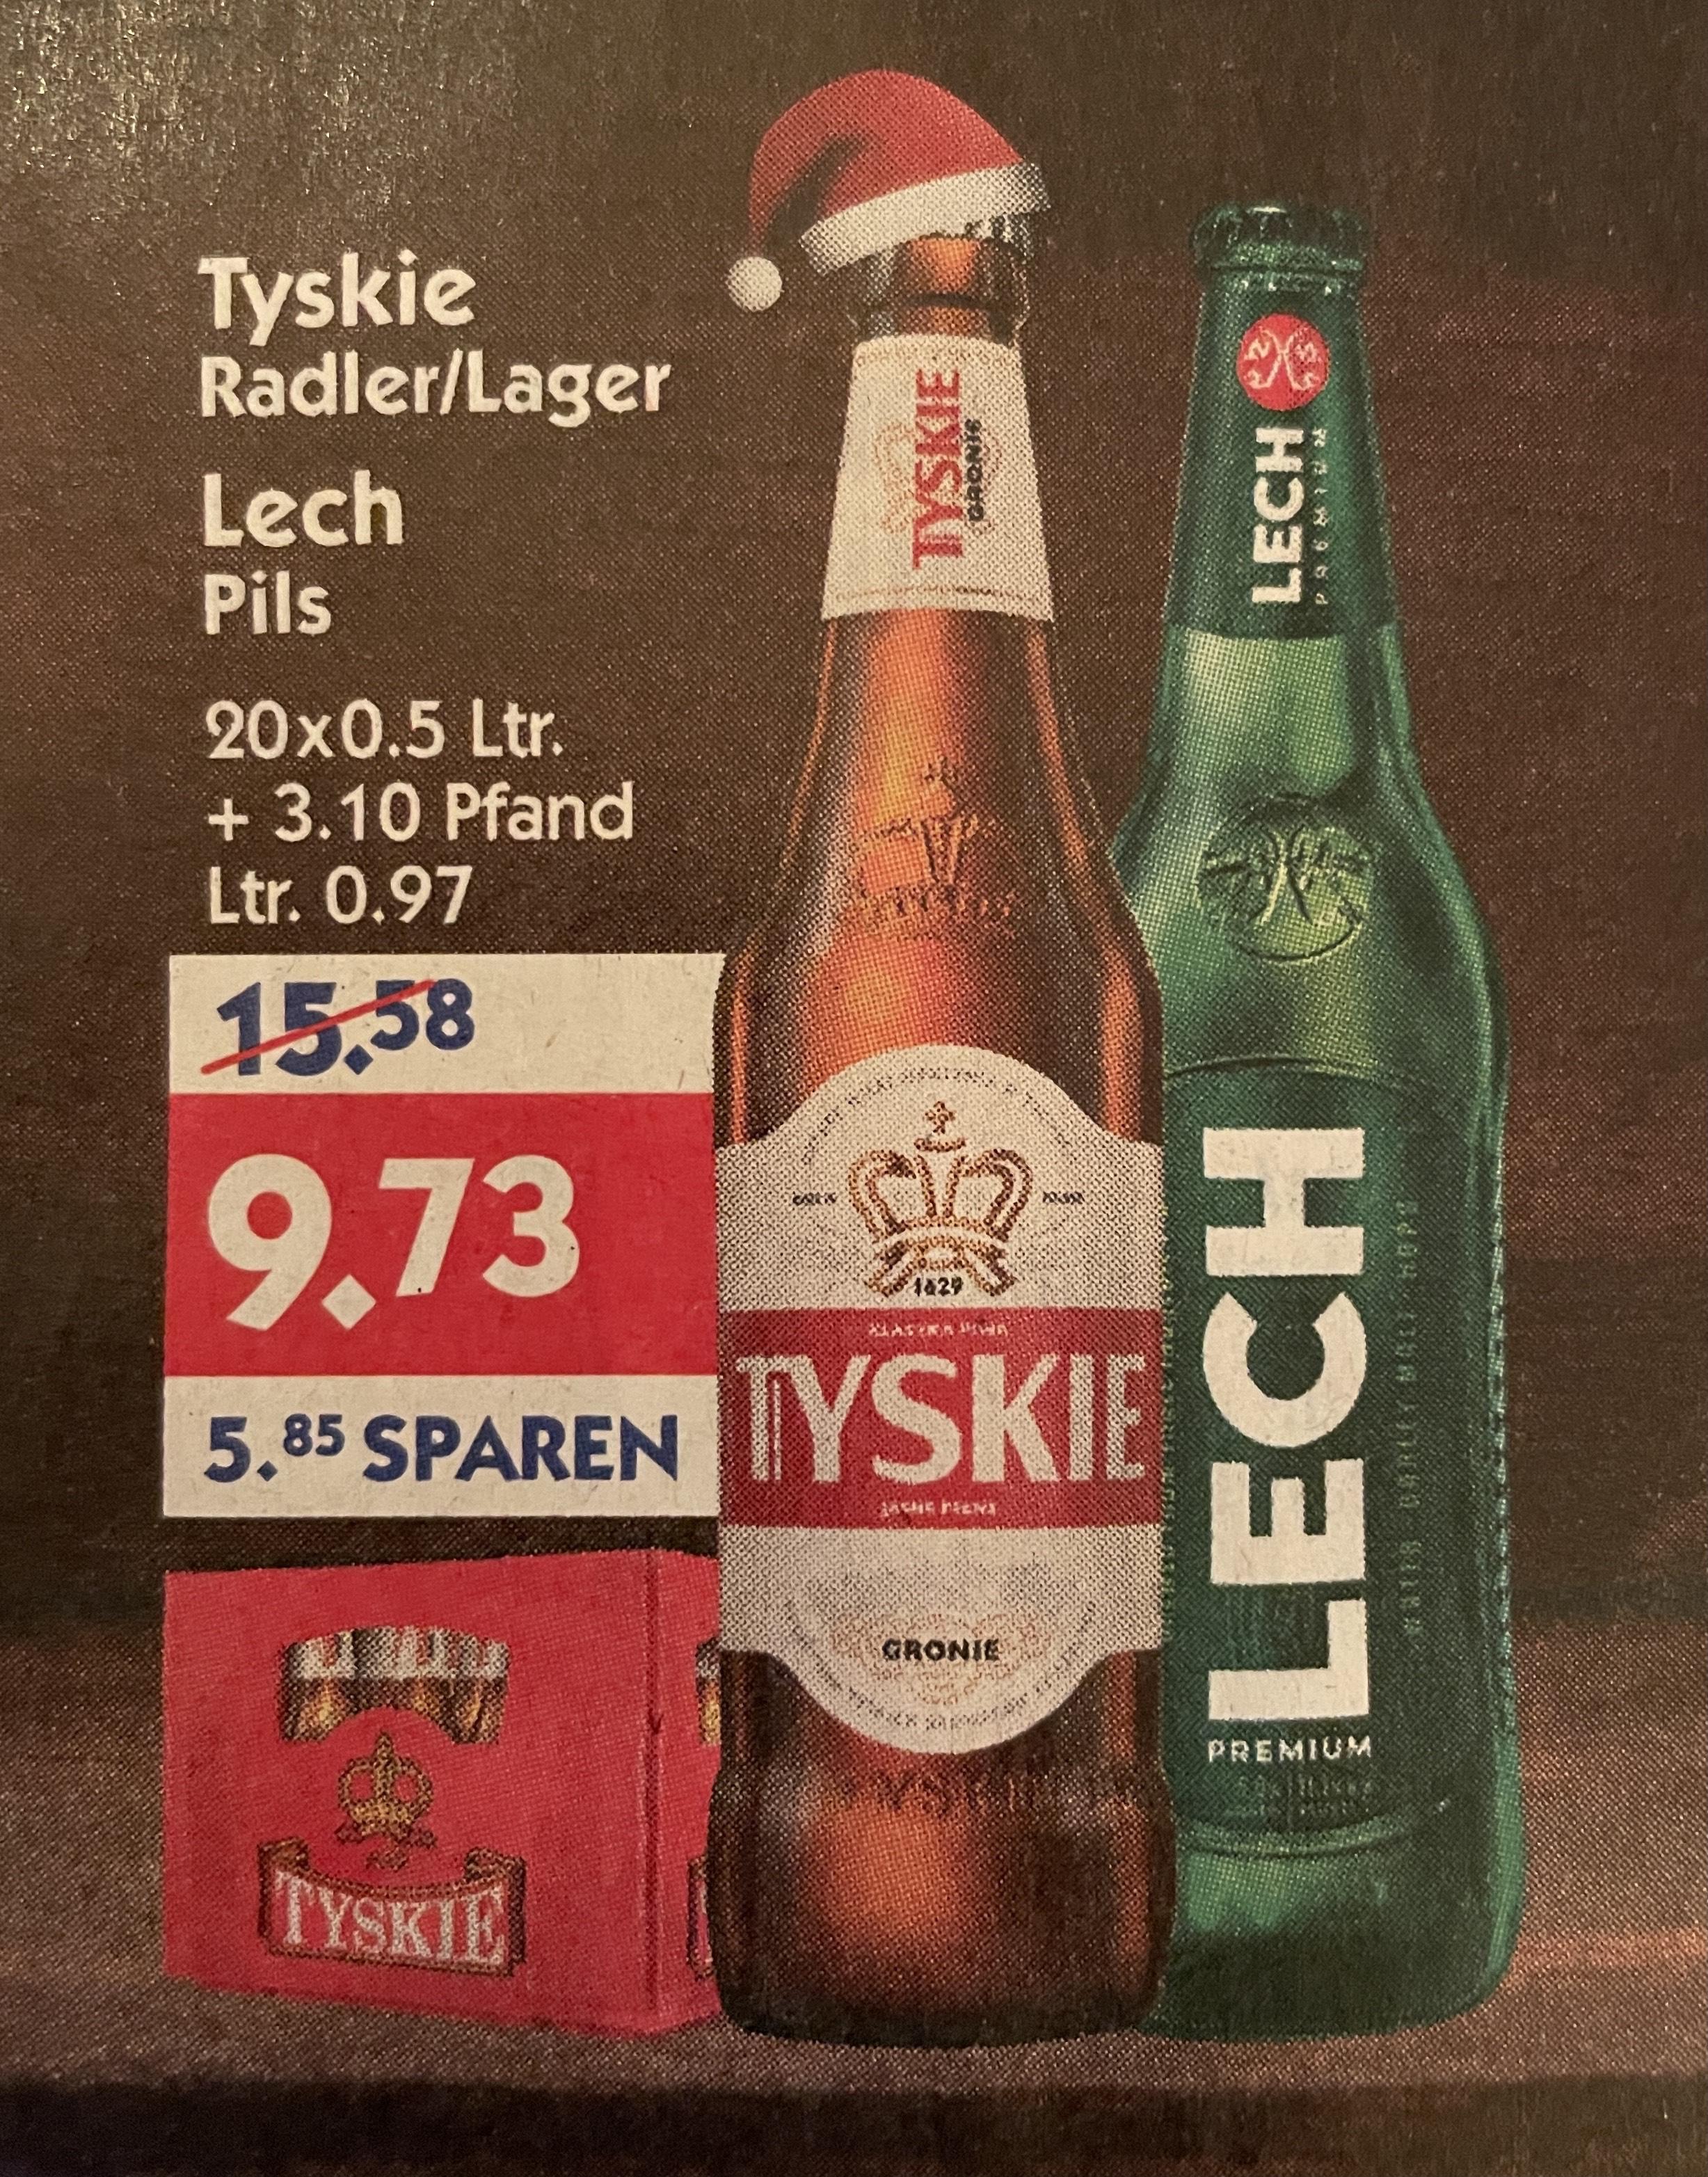 [Hol' Ab] Kiste Tyskie Lager oder Radler - Kiste Lech Pils 20x0.5l für 9.73€ zzgl. 3.10€